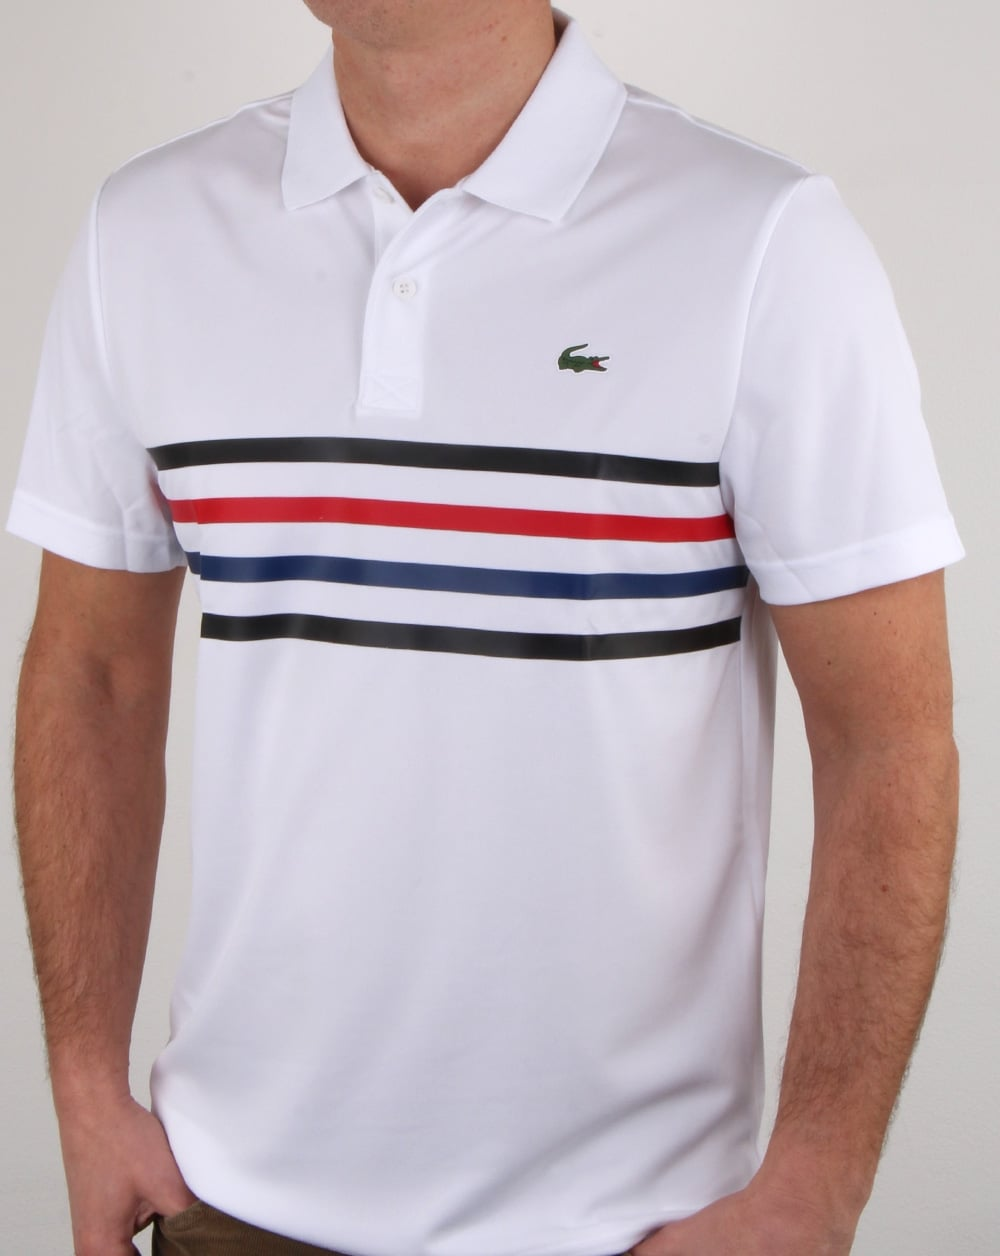 mens white lacoste polo shirt